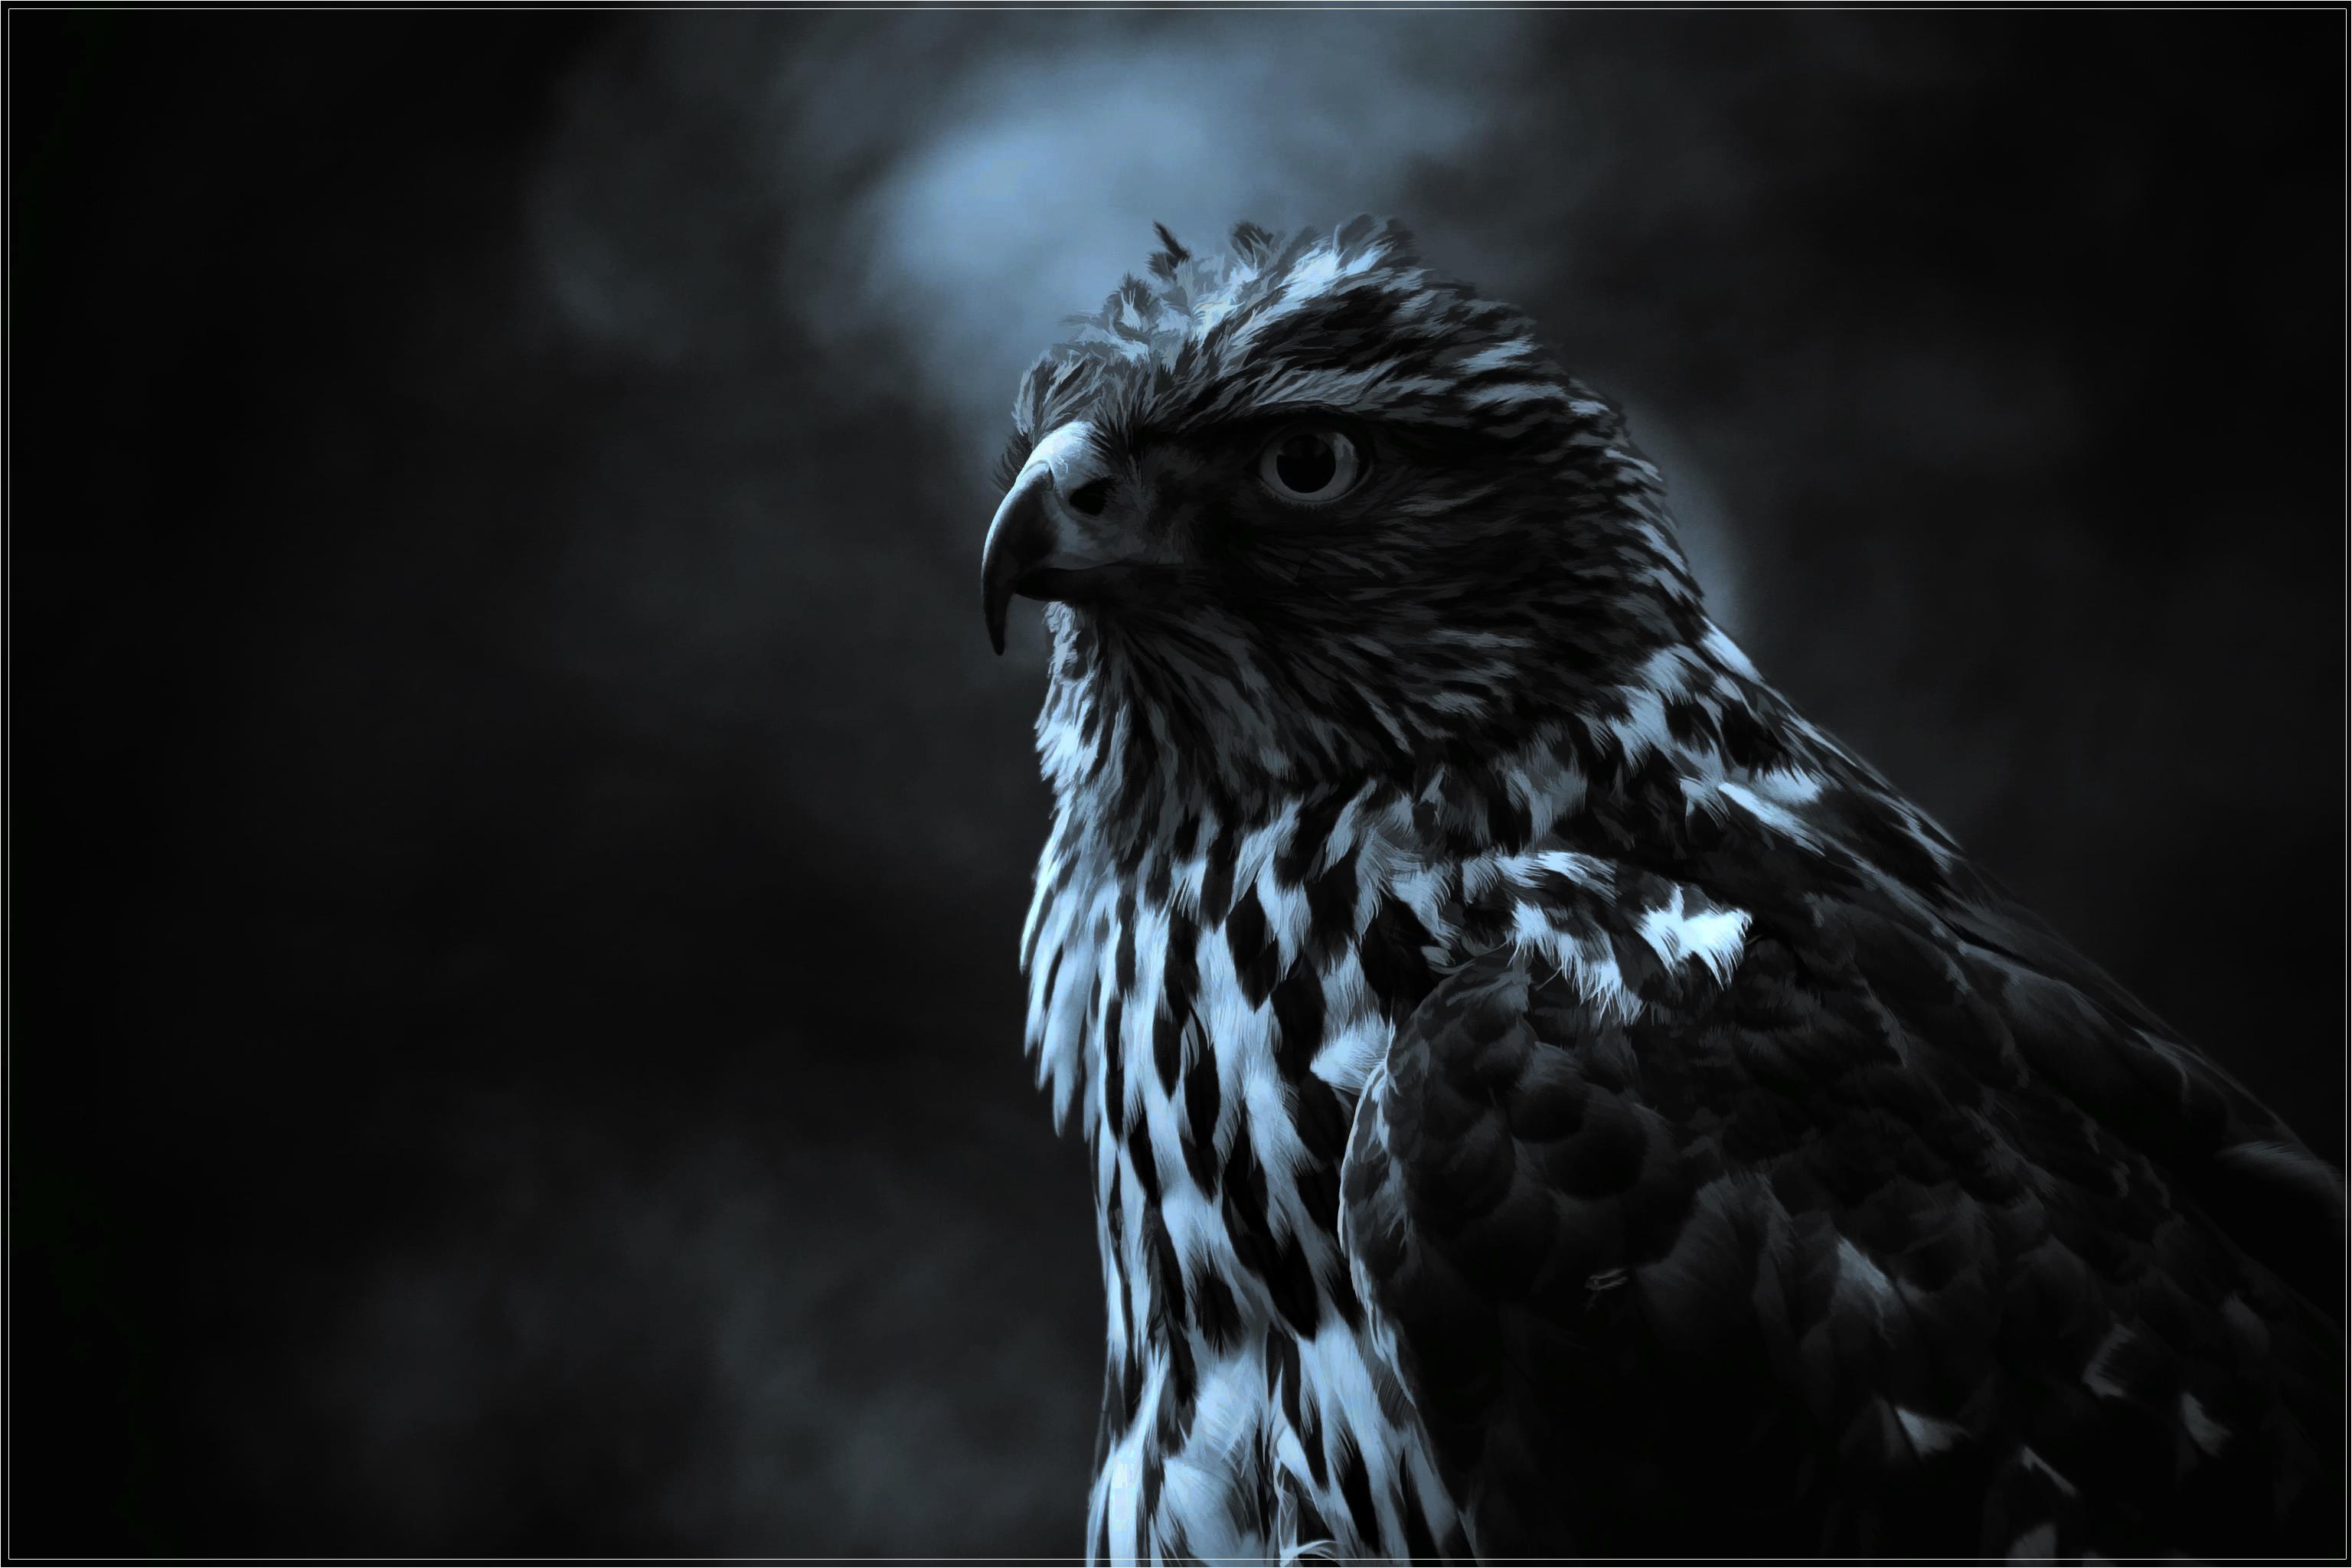 hawk hd wallpaper - photo #37